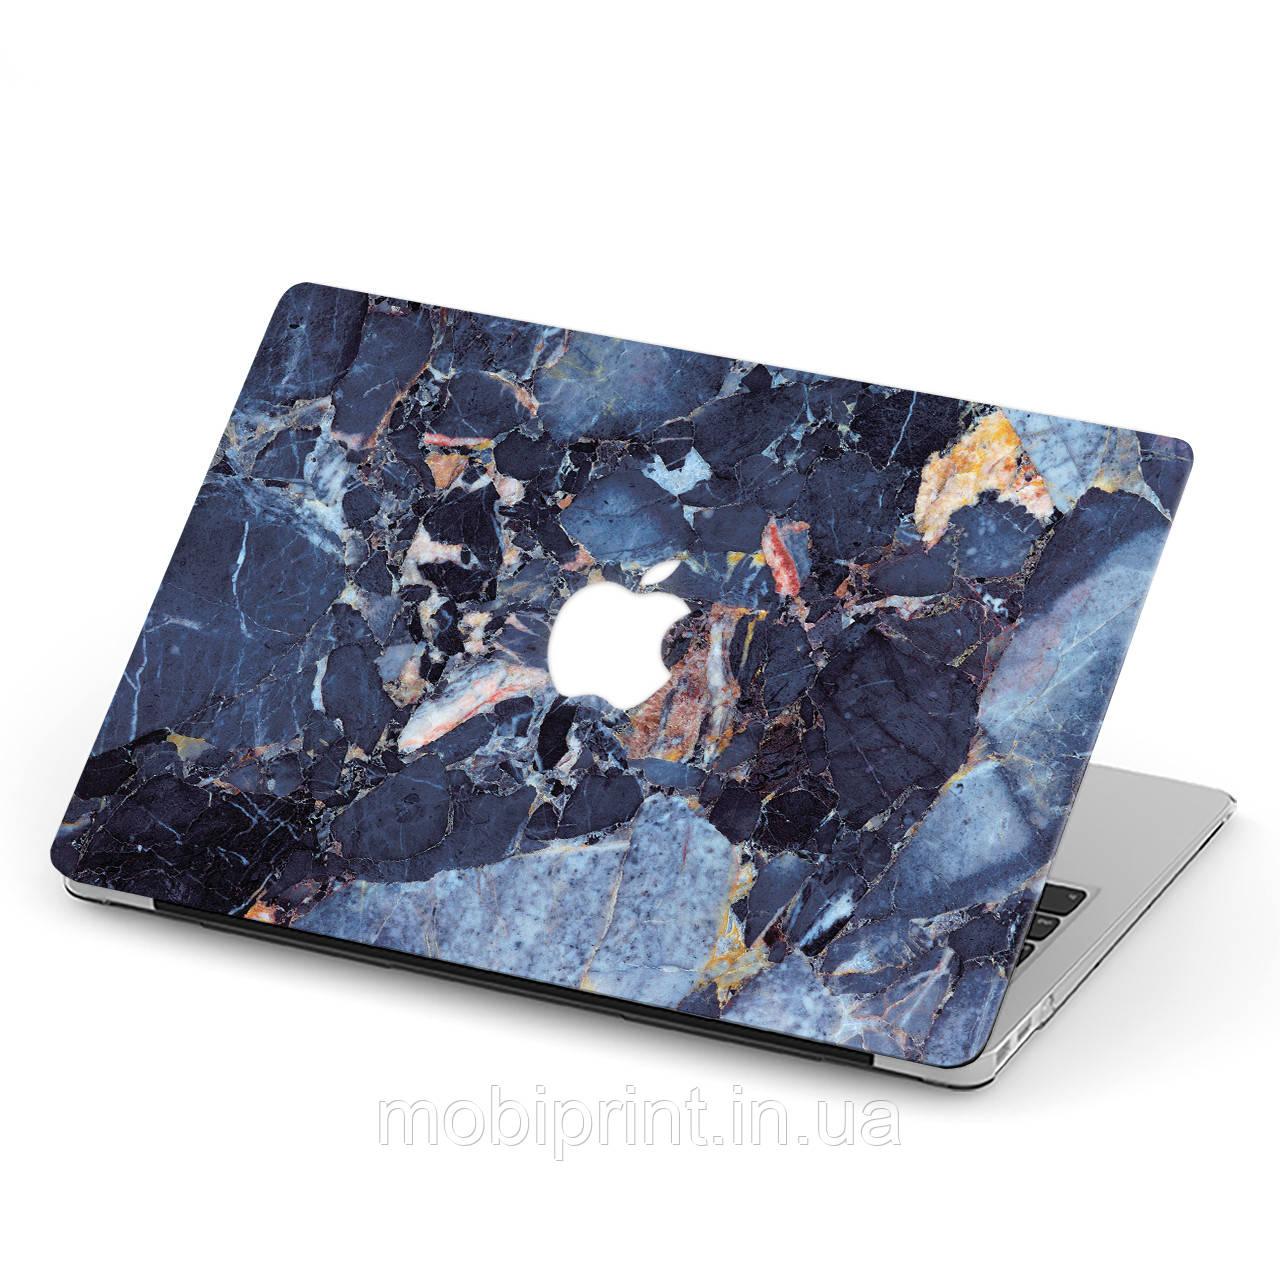 Чехол пластиковый для Apple MacBook Pro / Air Мрамор (Marble) макбук про case hard cover